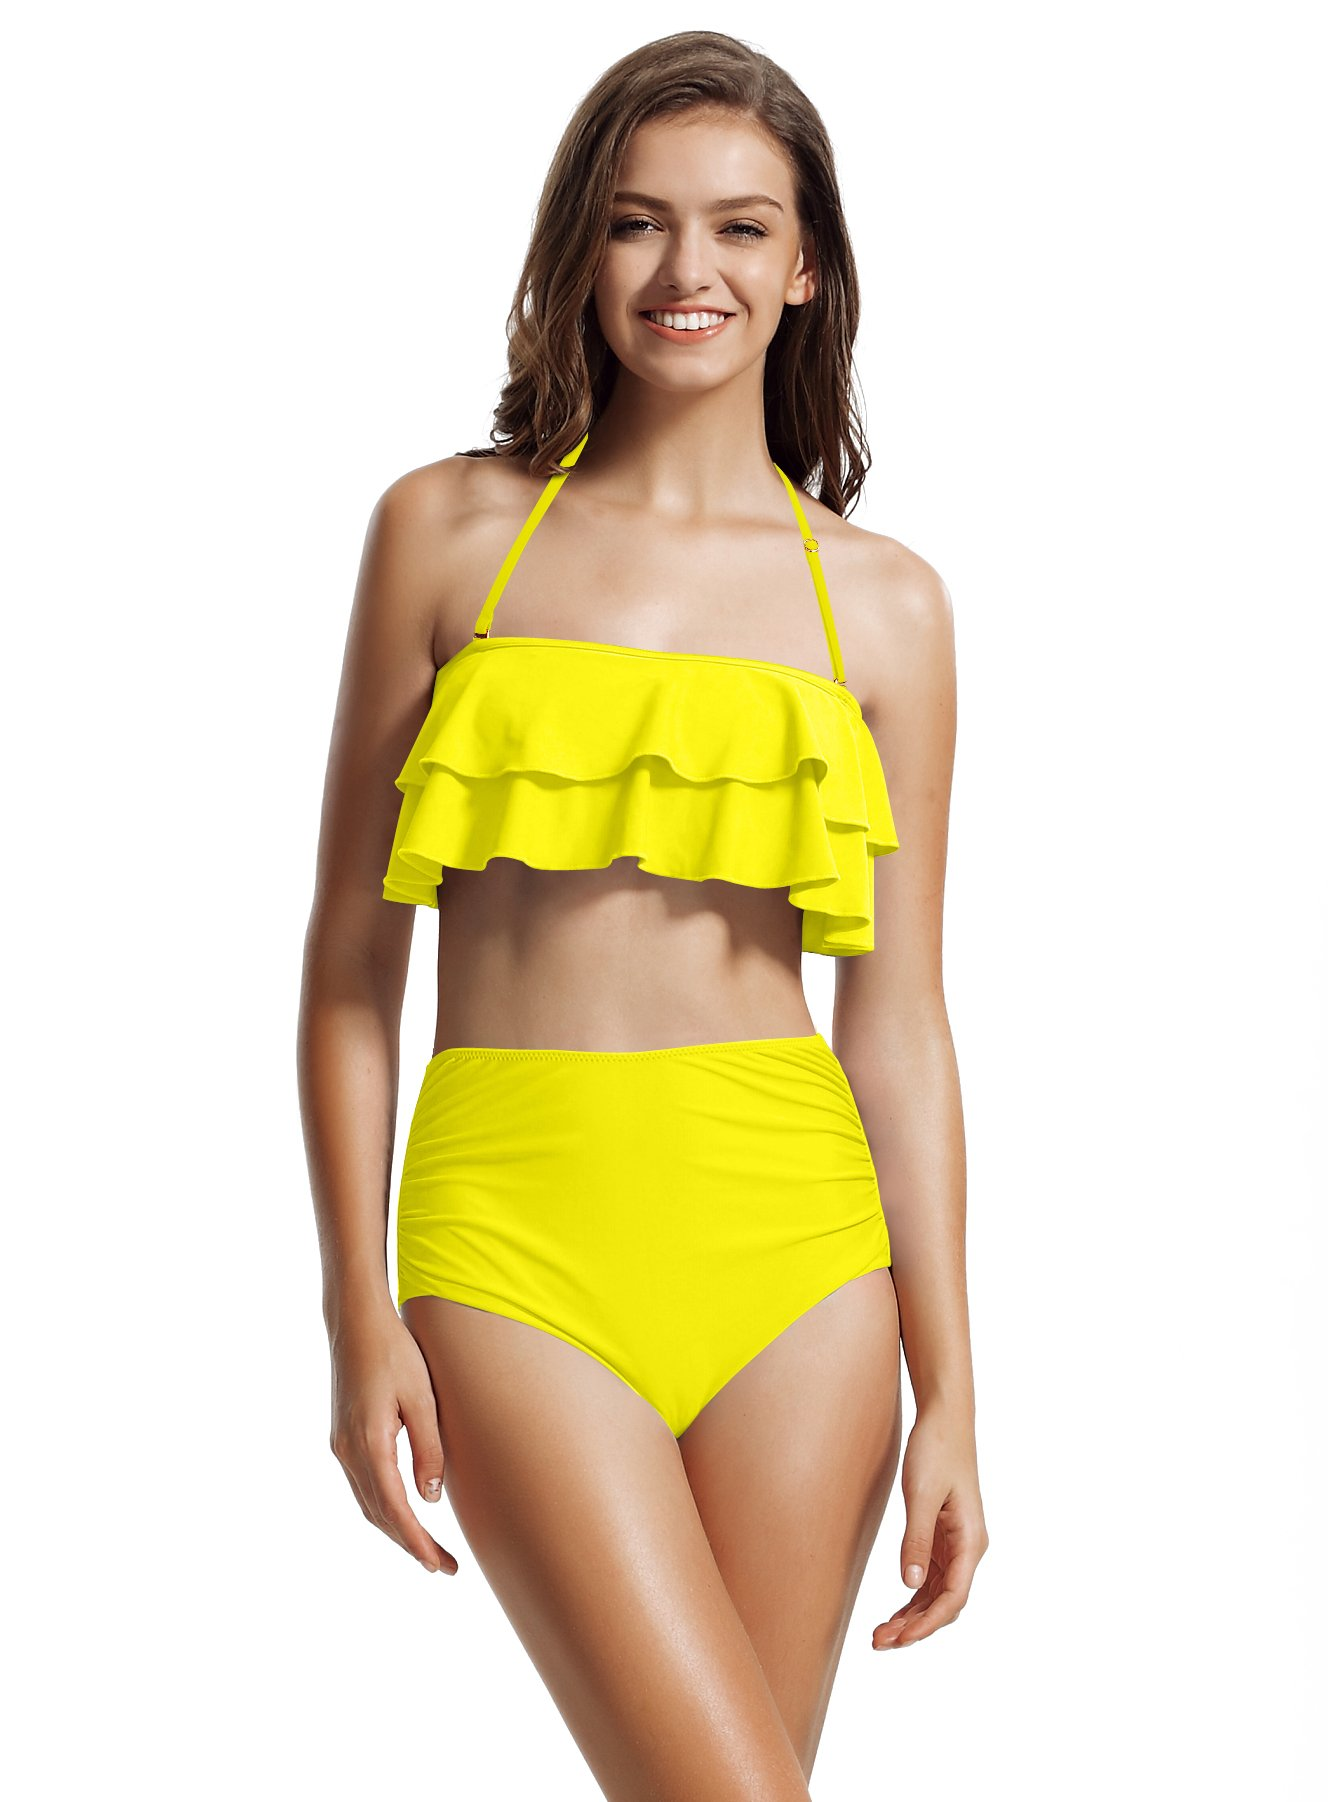 509b1fa0dda zeraca Women's Ruffle Bandeau High Waisted Bikini Bathing Suits | Amazon